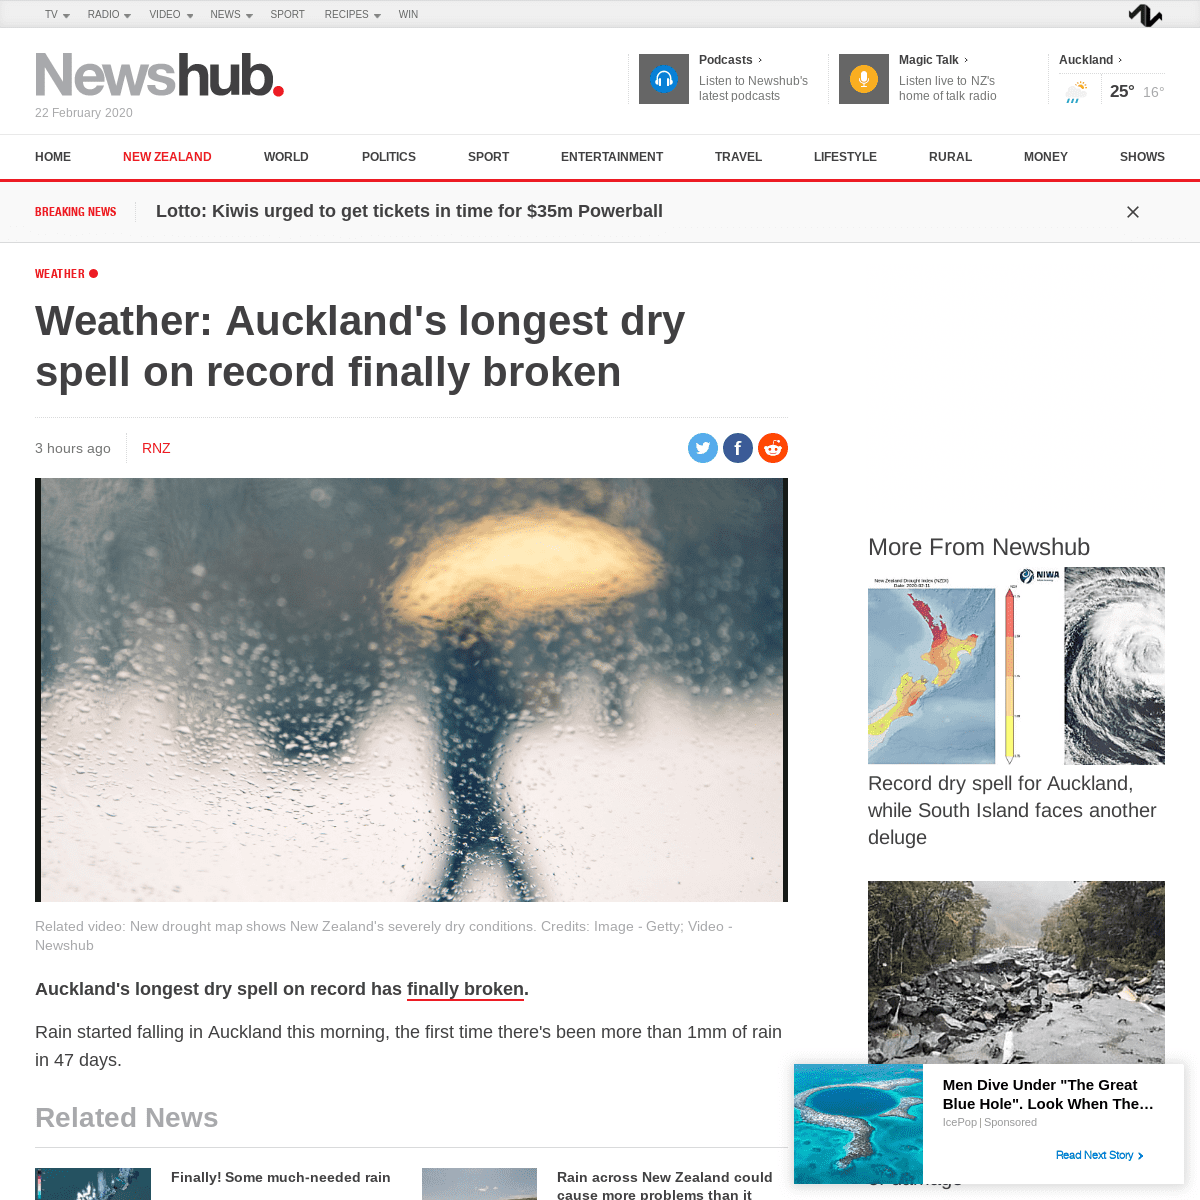 ArchiveBay.com - www.newshub.co.nz/home/new-zealand/2020/02/weather-auckland-s-longest-dry-spell-on-record-finally-broken.html - Weather- Auckland's longest dry spell on record finally broken - Newshub